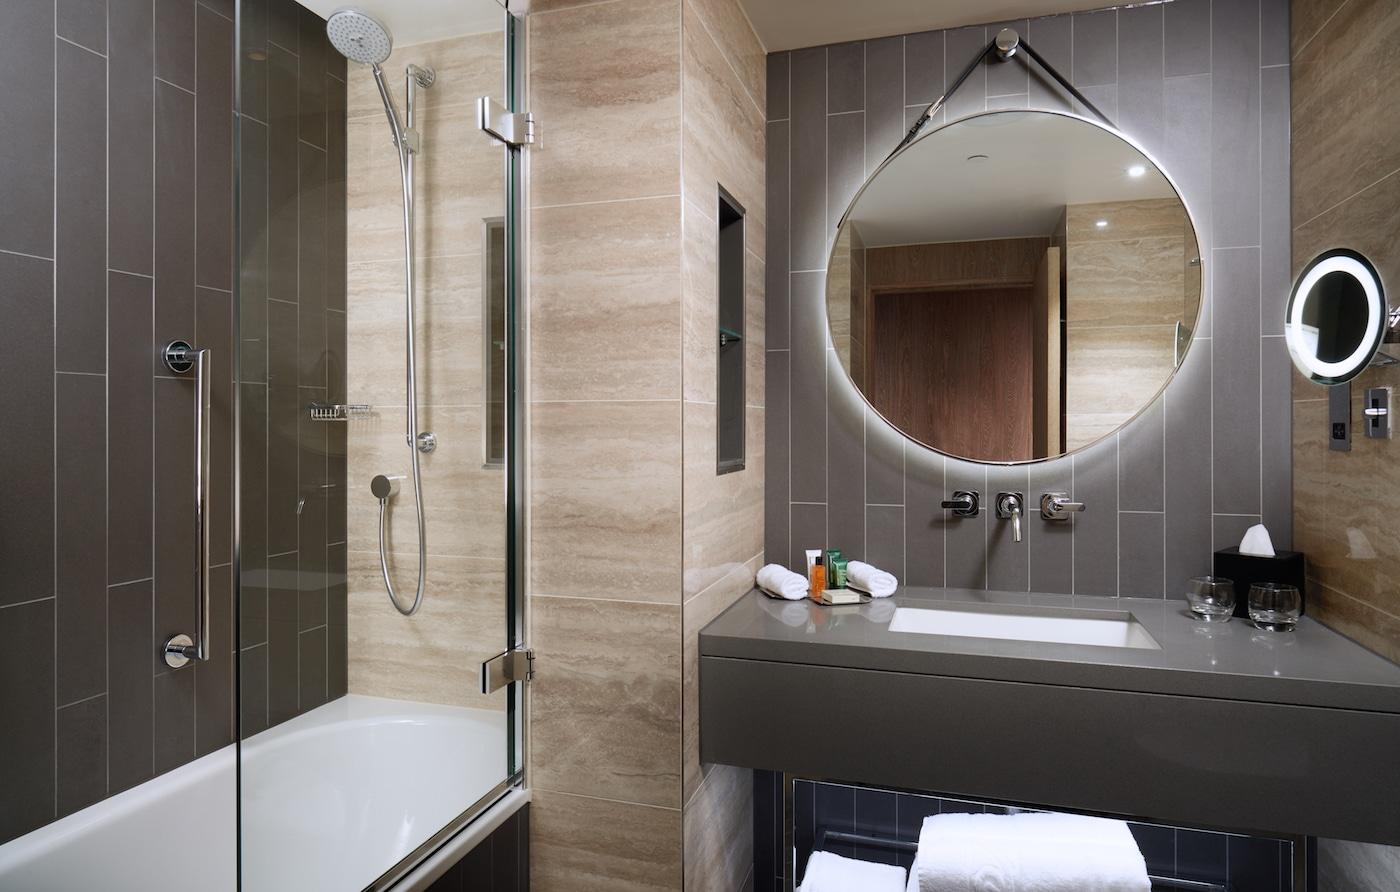 Hilton London Bankside Hotel Guestroom Bathroom